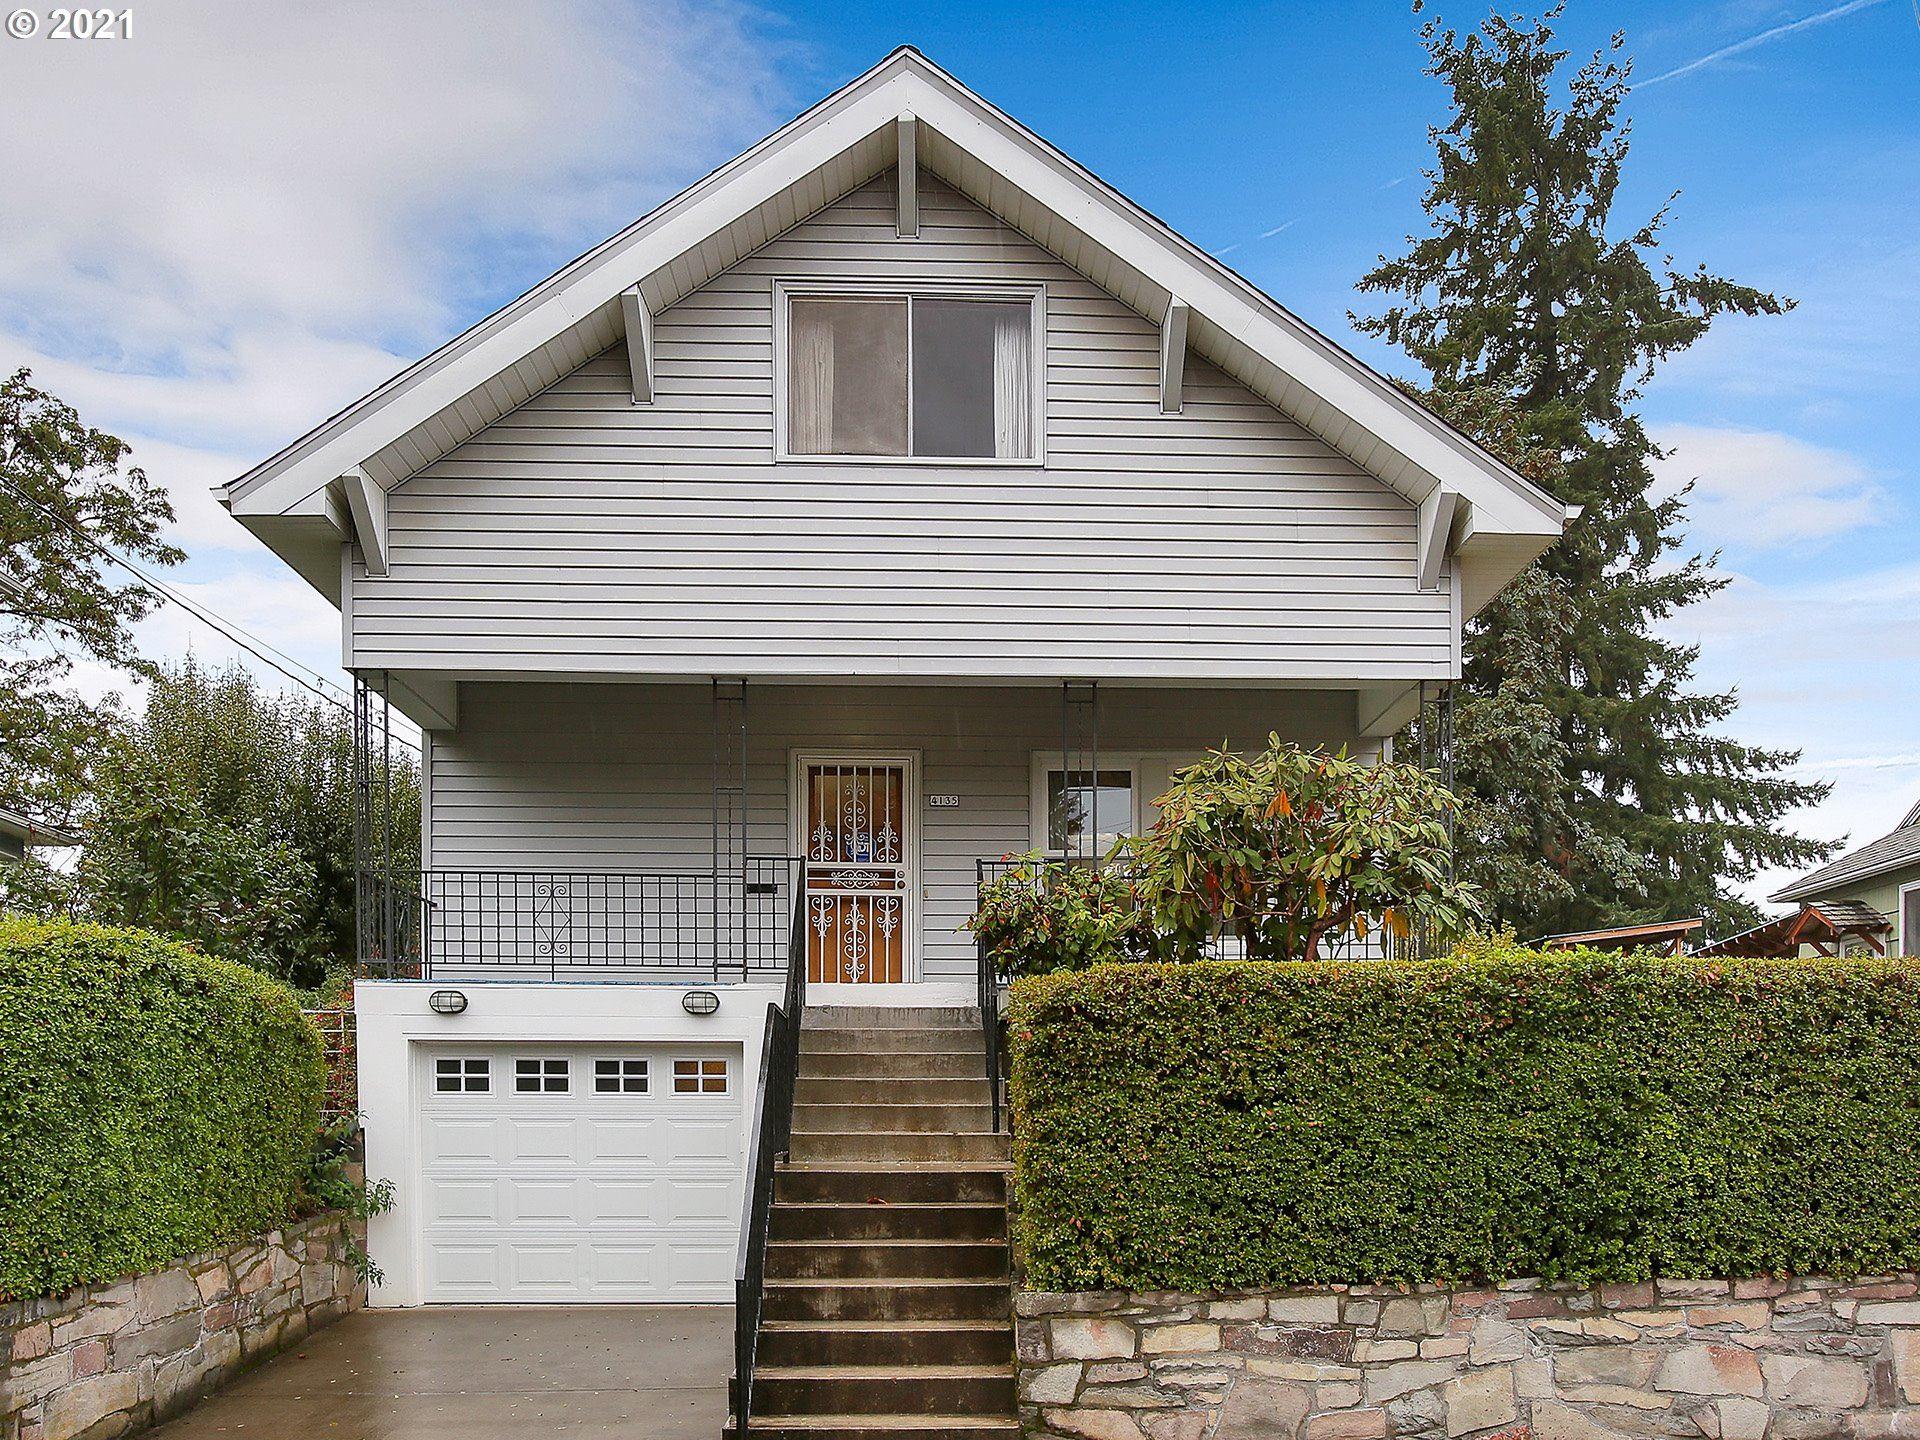 4135 SE 28TH PL, Portland, OR 97202 - MLS#: 21002107